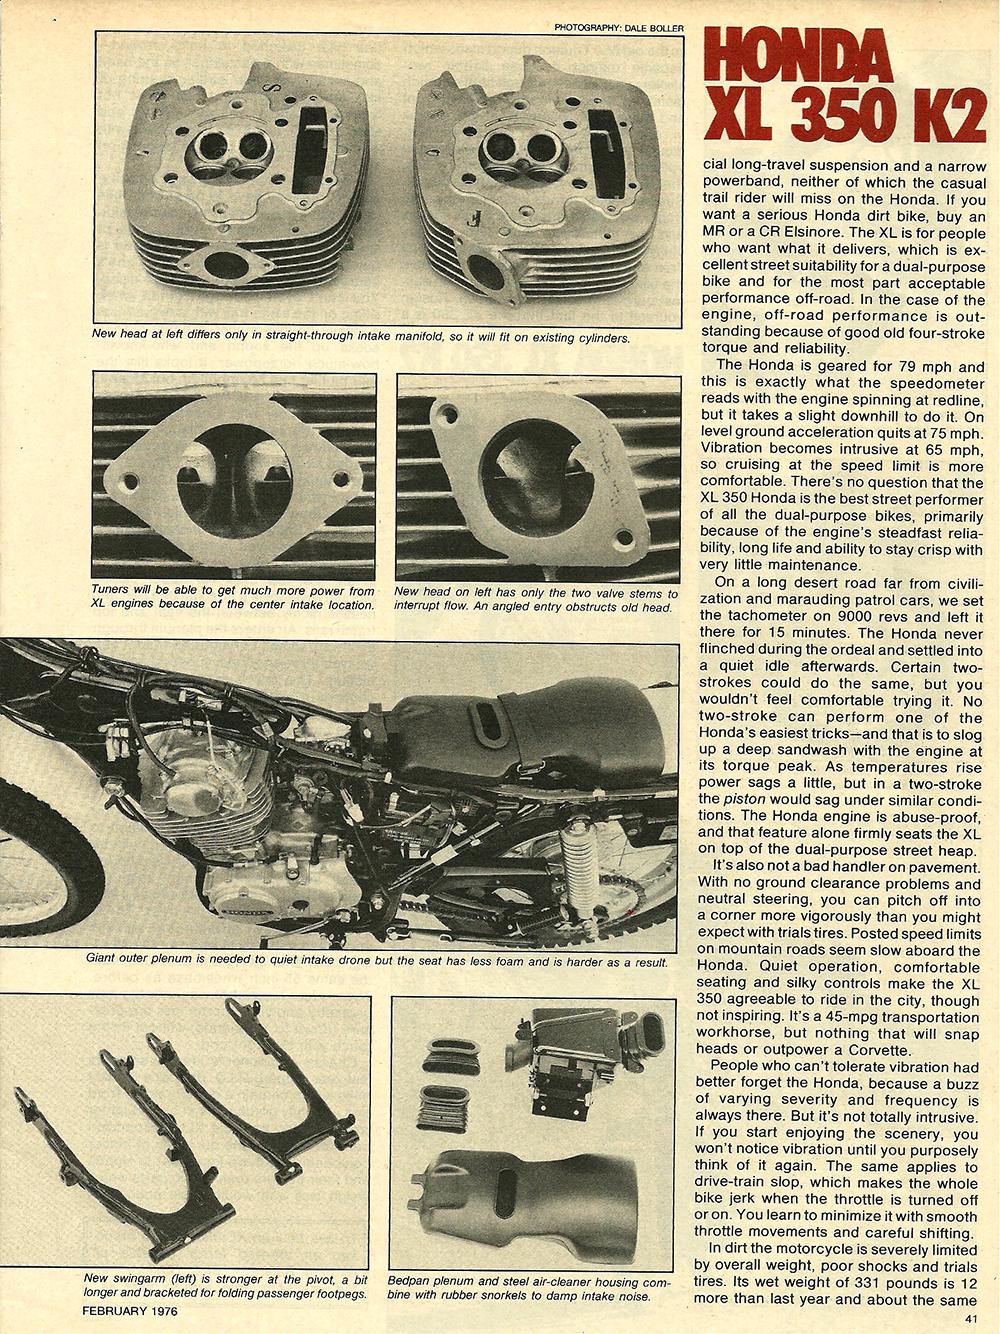 1976 Honda XL 350 K2 road test 4.jpg